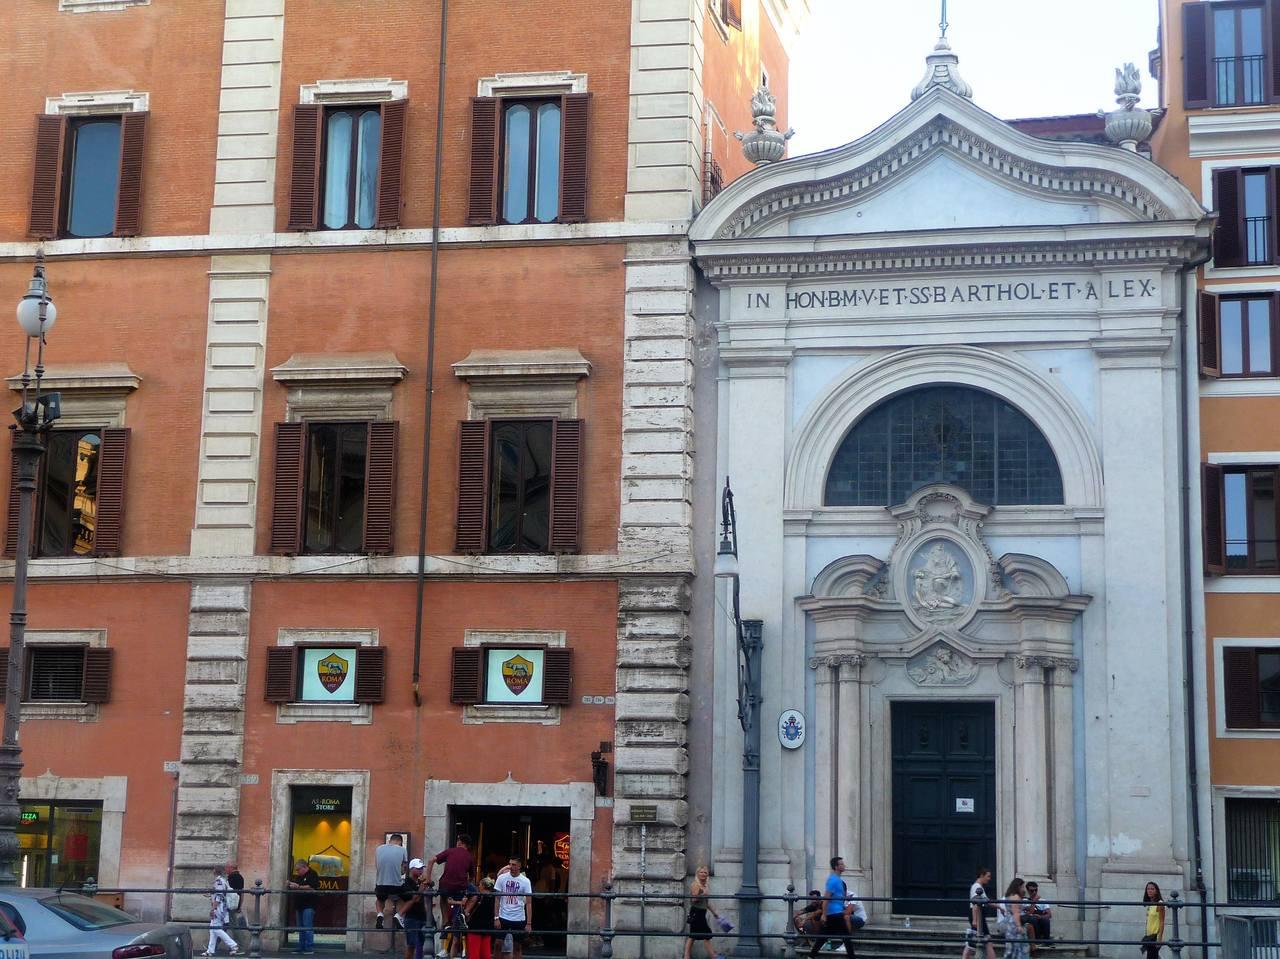 Santi Bartolomeo ed Alessandro dei Bergamaschi